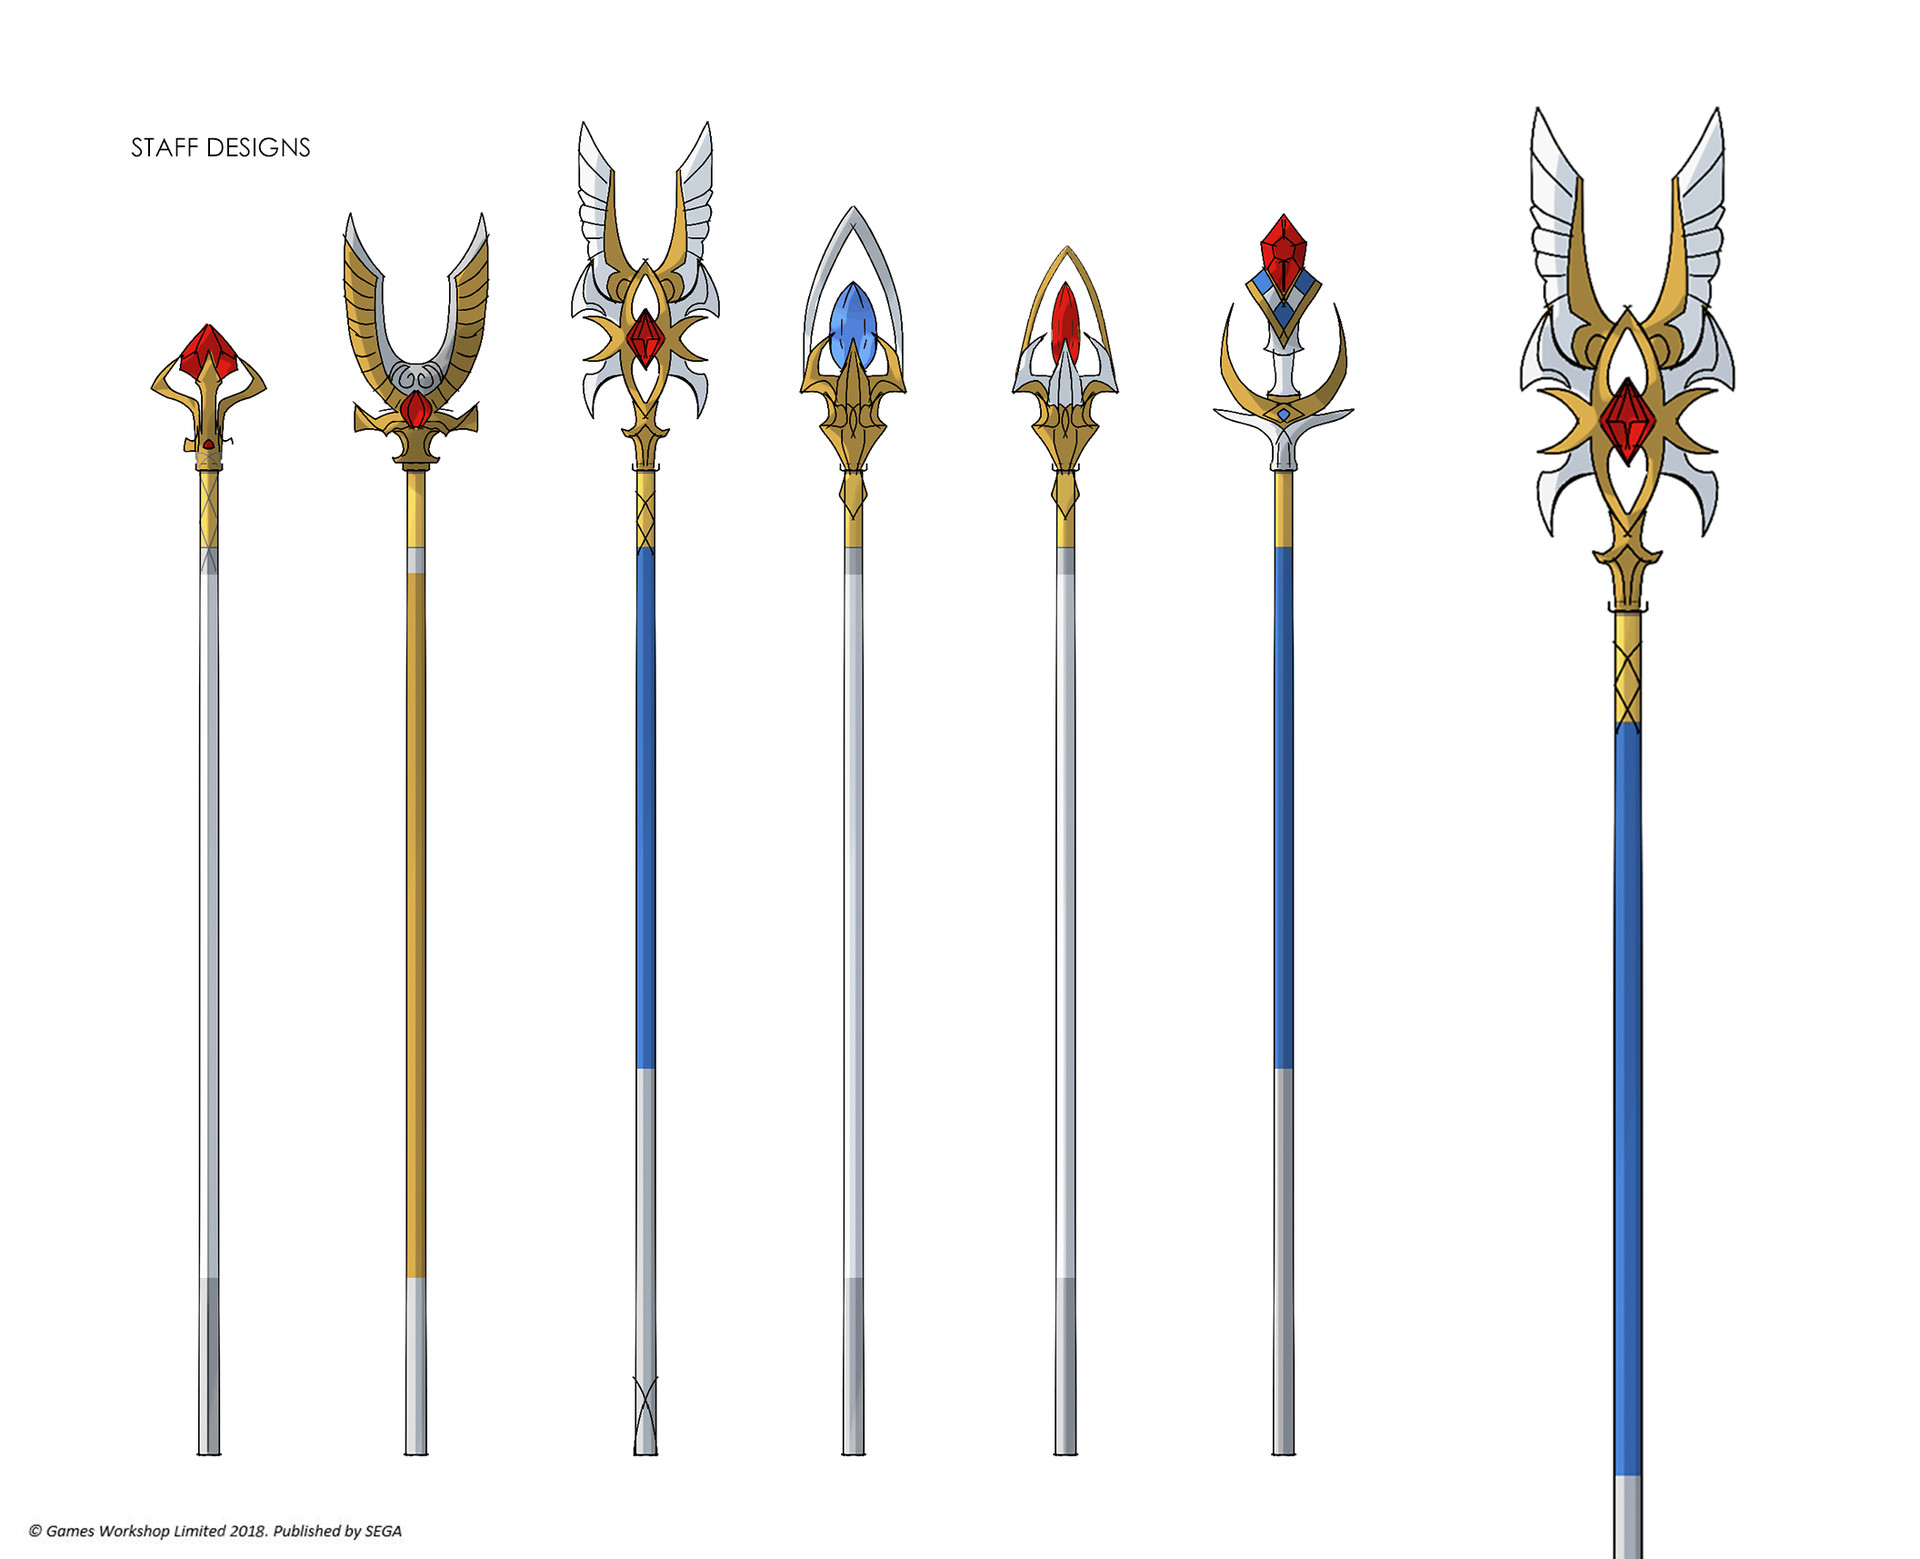 Staff designs